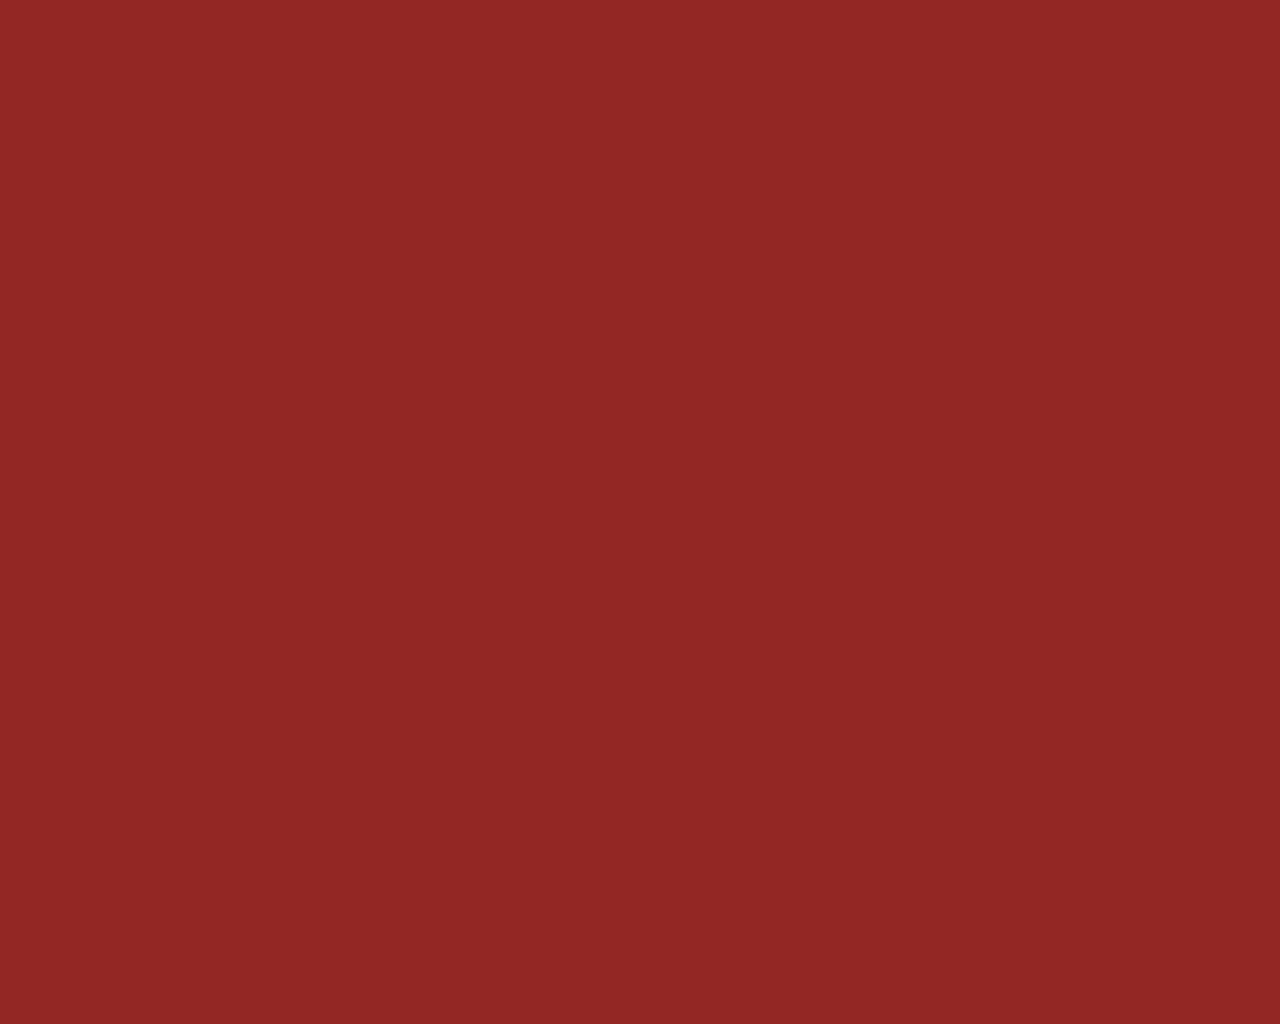 1280x1024 Vivid Auburn Solid Color Background